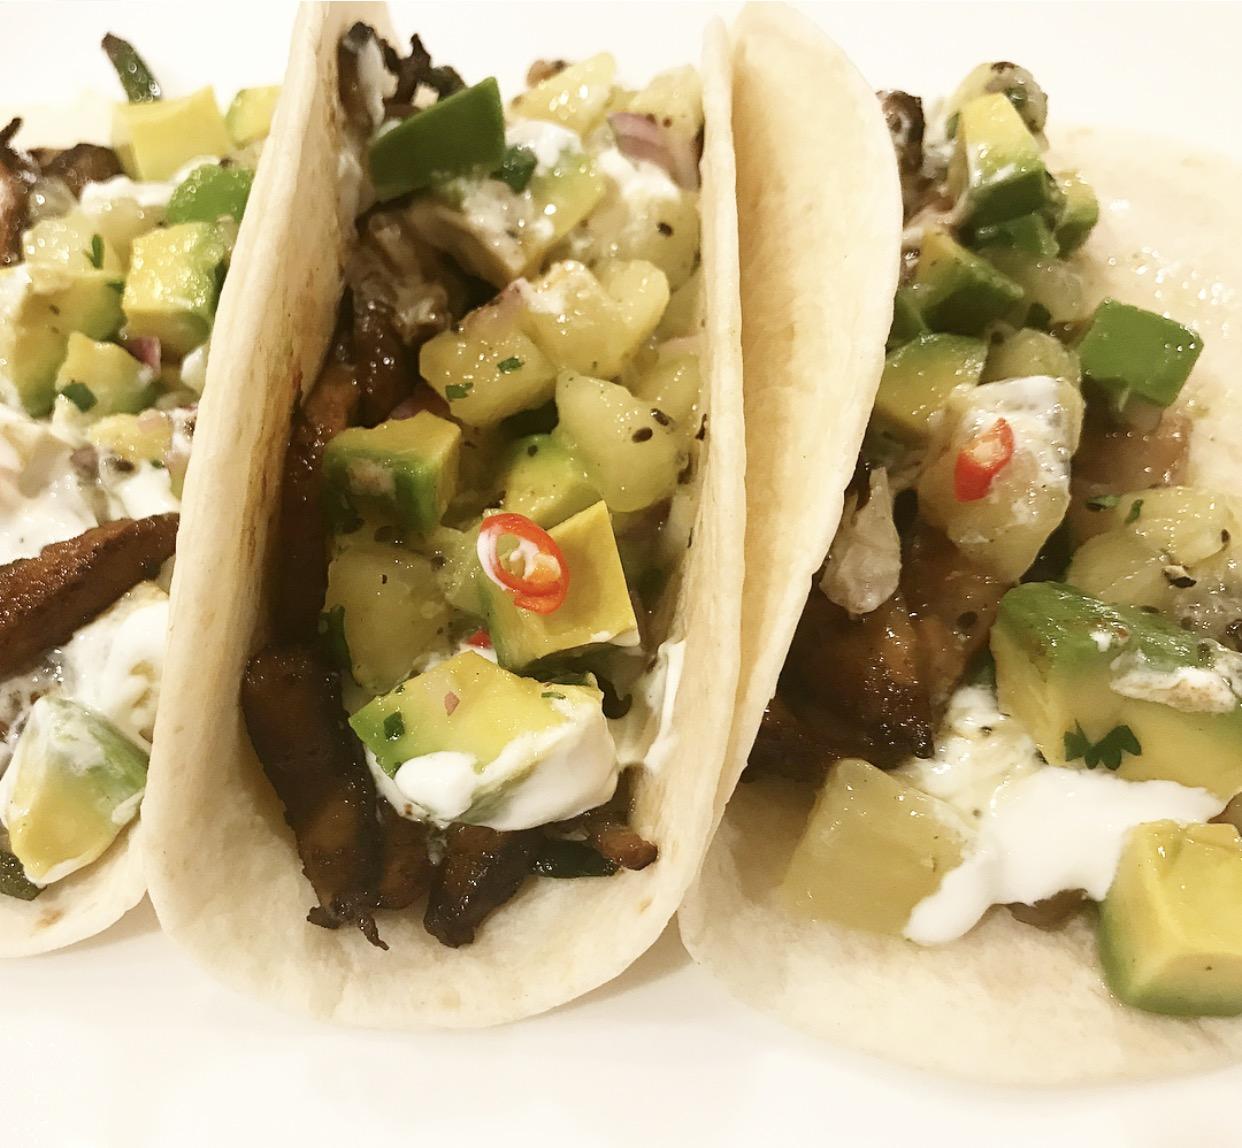 Portobello mushroom tacos with avocado and kiwi salsa